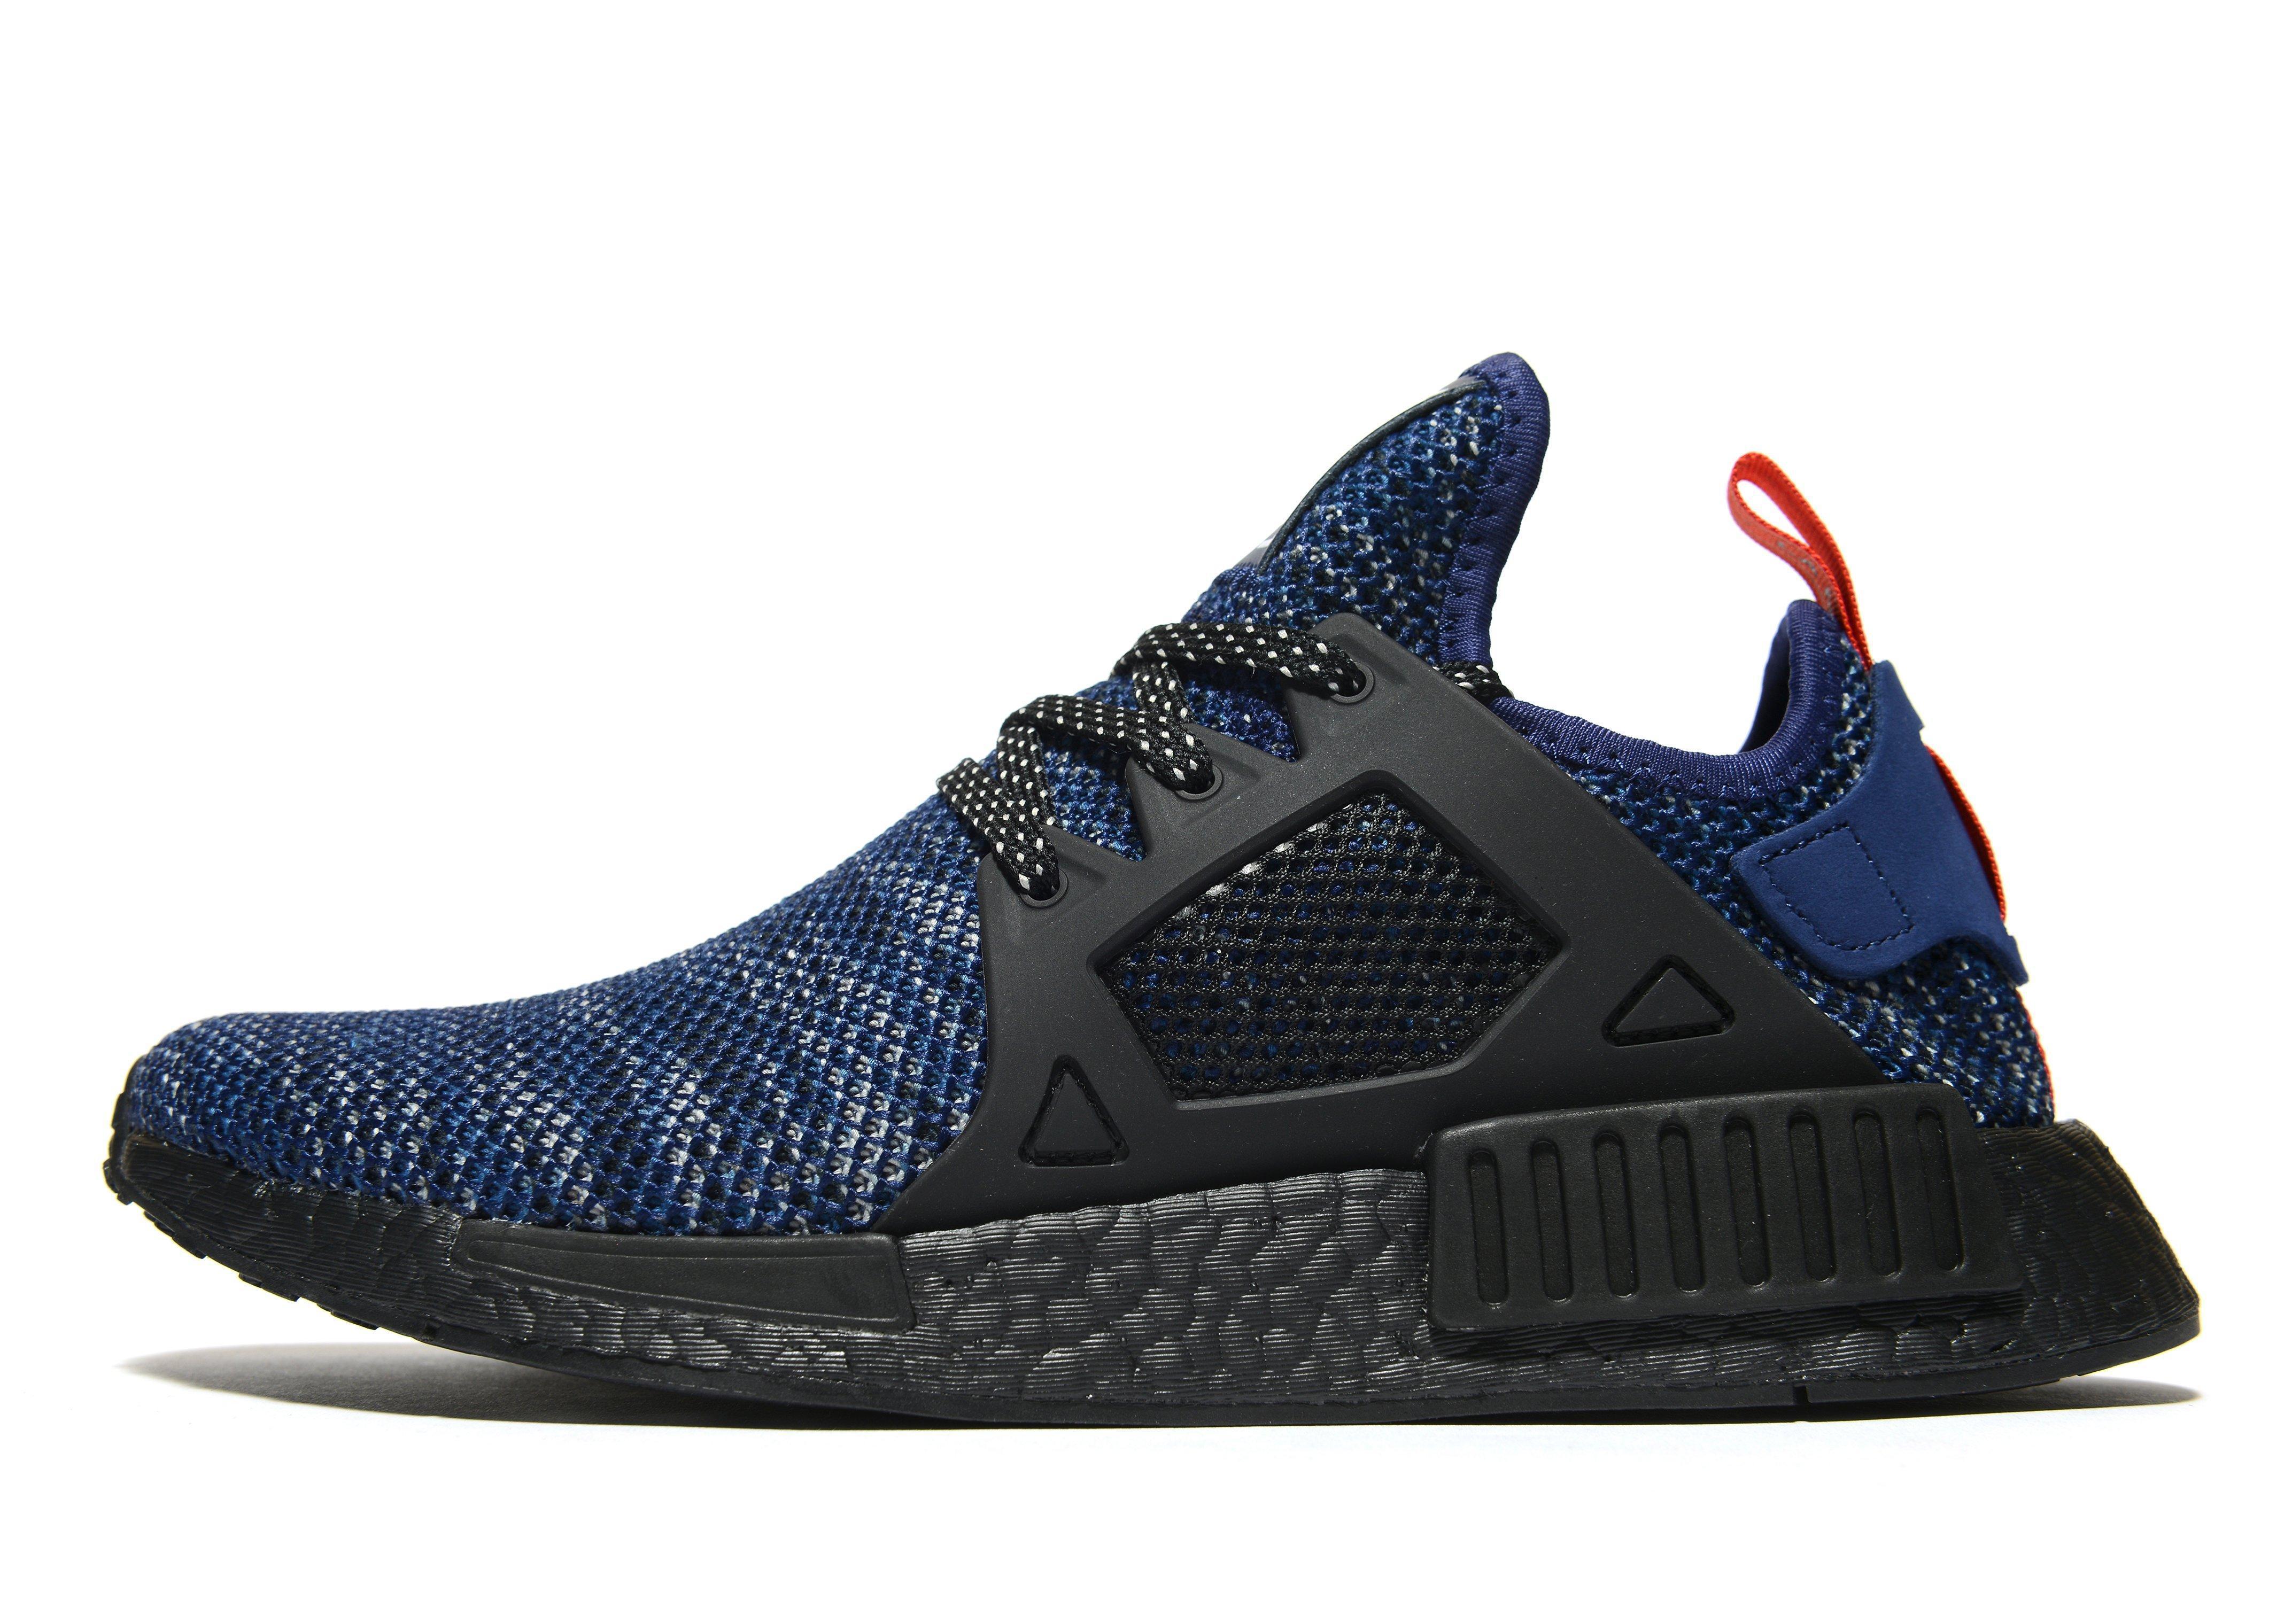 ac0d18985fea1 Lyst - adidas Originals Nmd Xr1 in Blue for Men